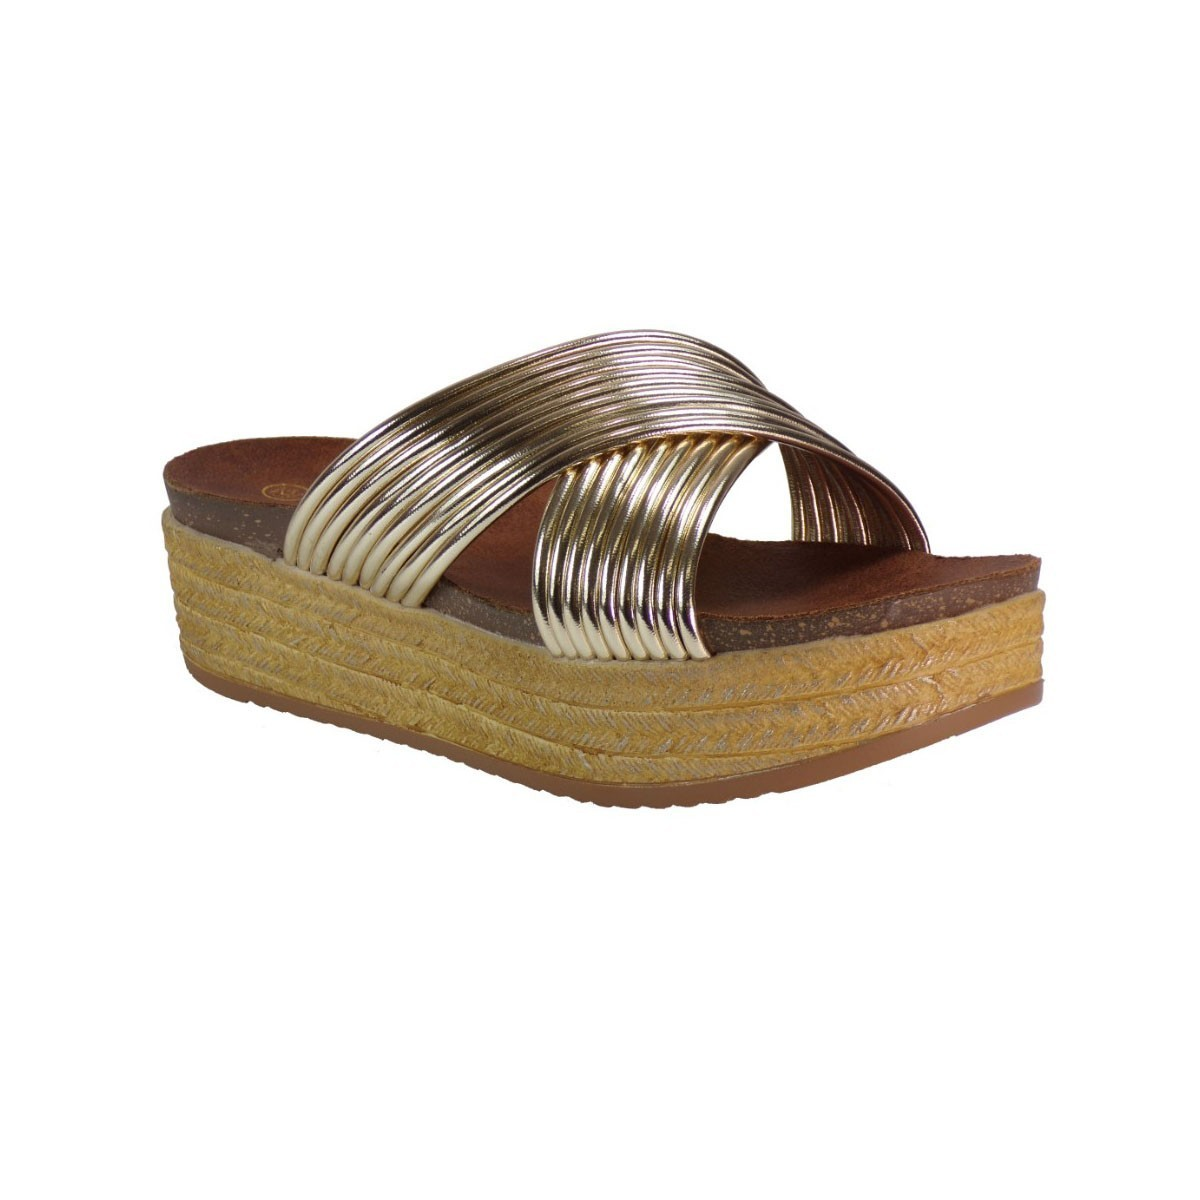 Envie Shoes Γυναικείες Παντόφλες Πλατφόρμες E64-05039 Χρυσό envie E64-05039 Χρυσό